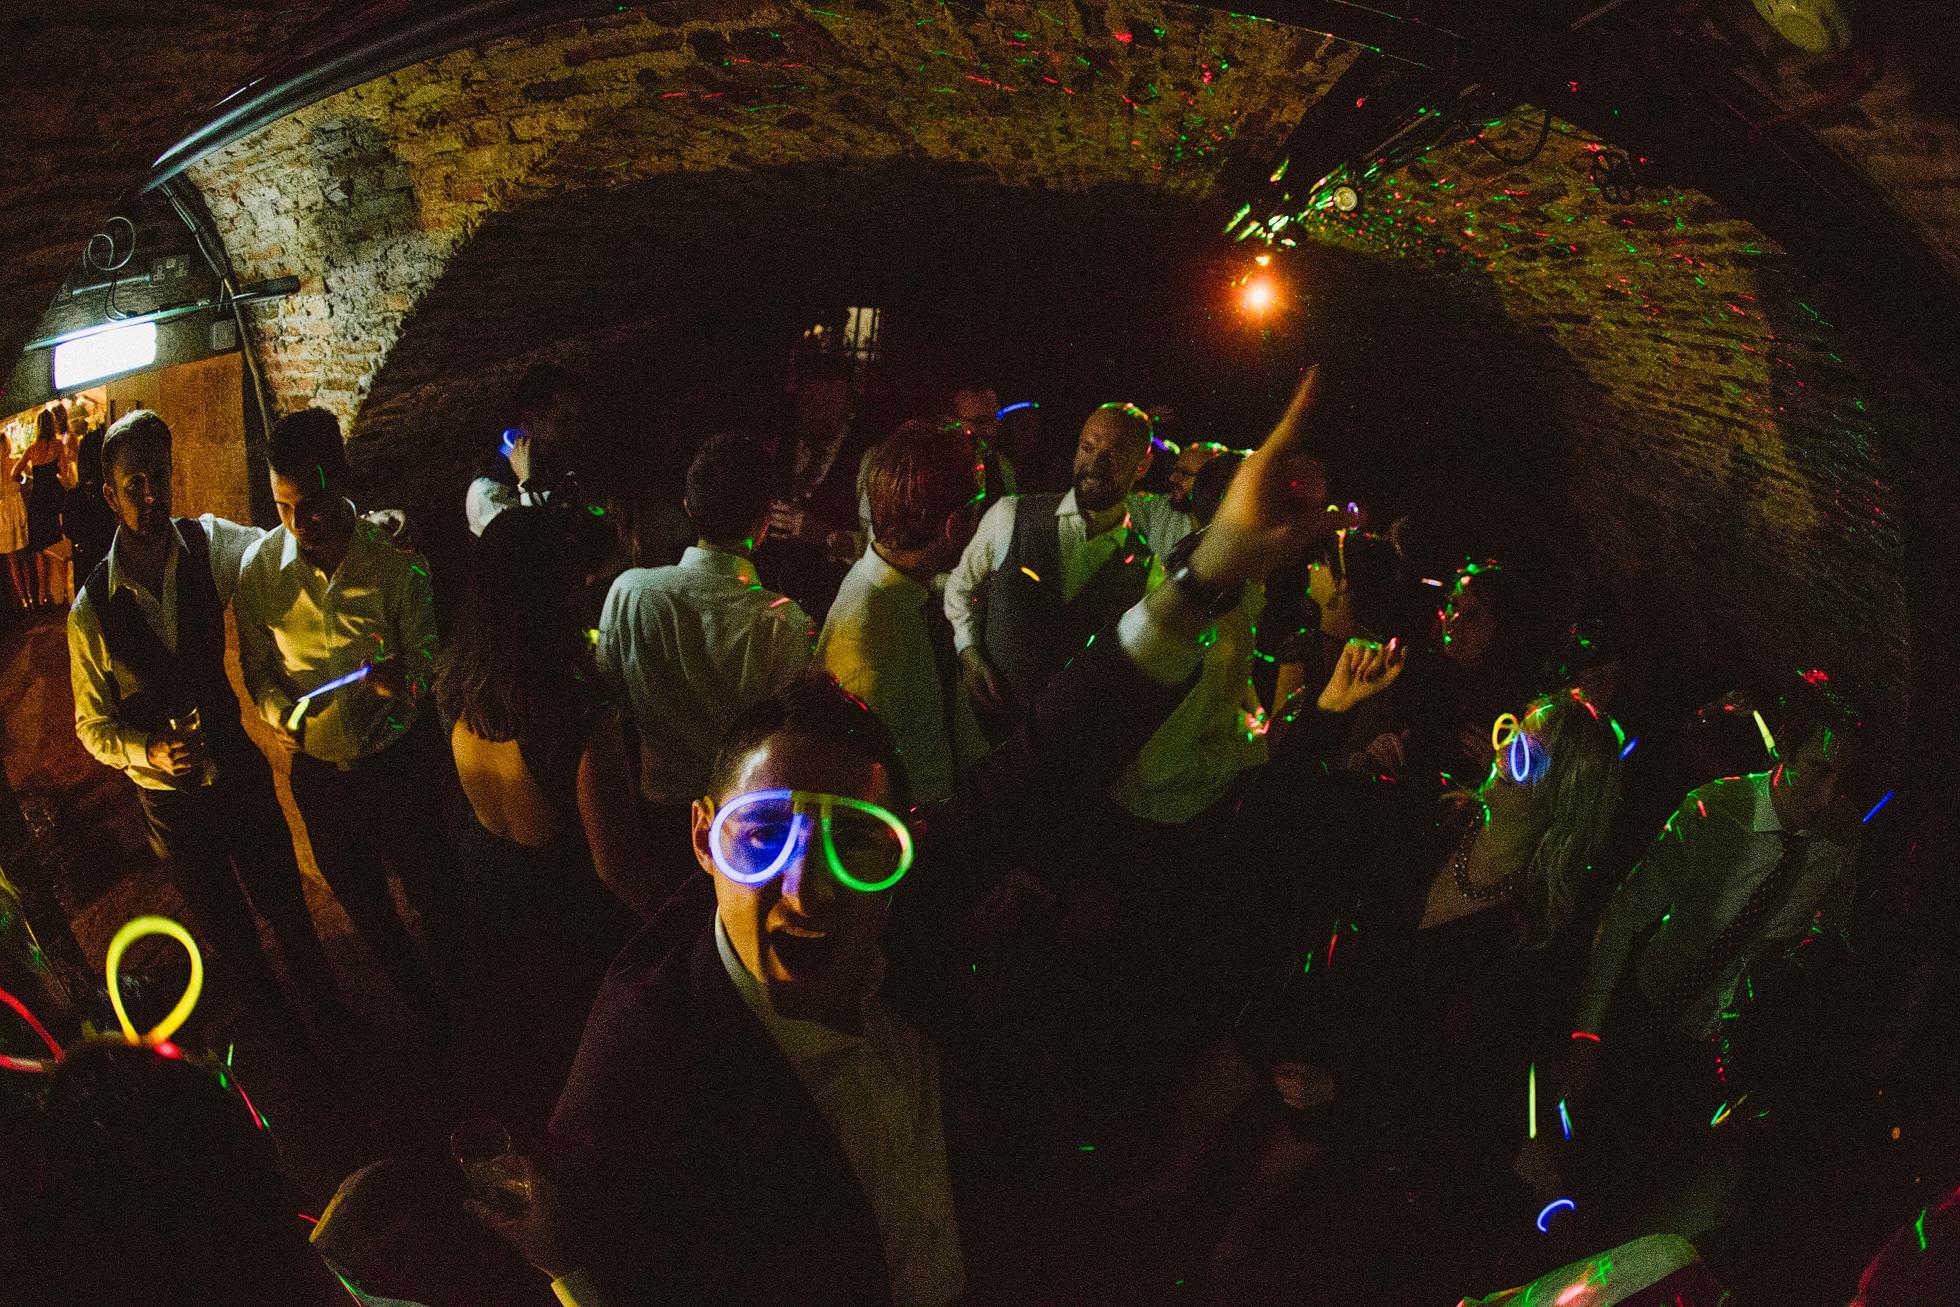 The Underground cellar at Middleton Lodge